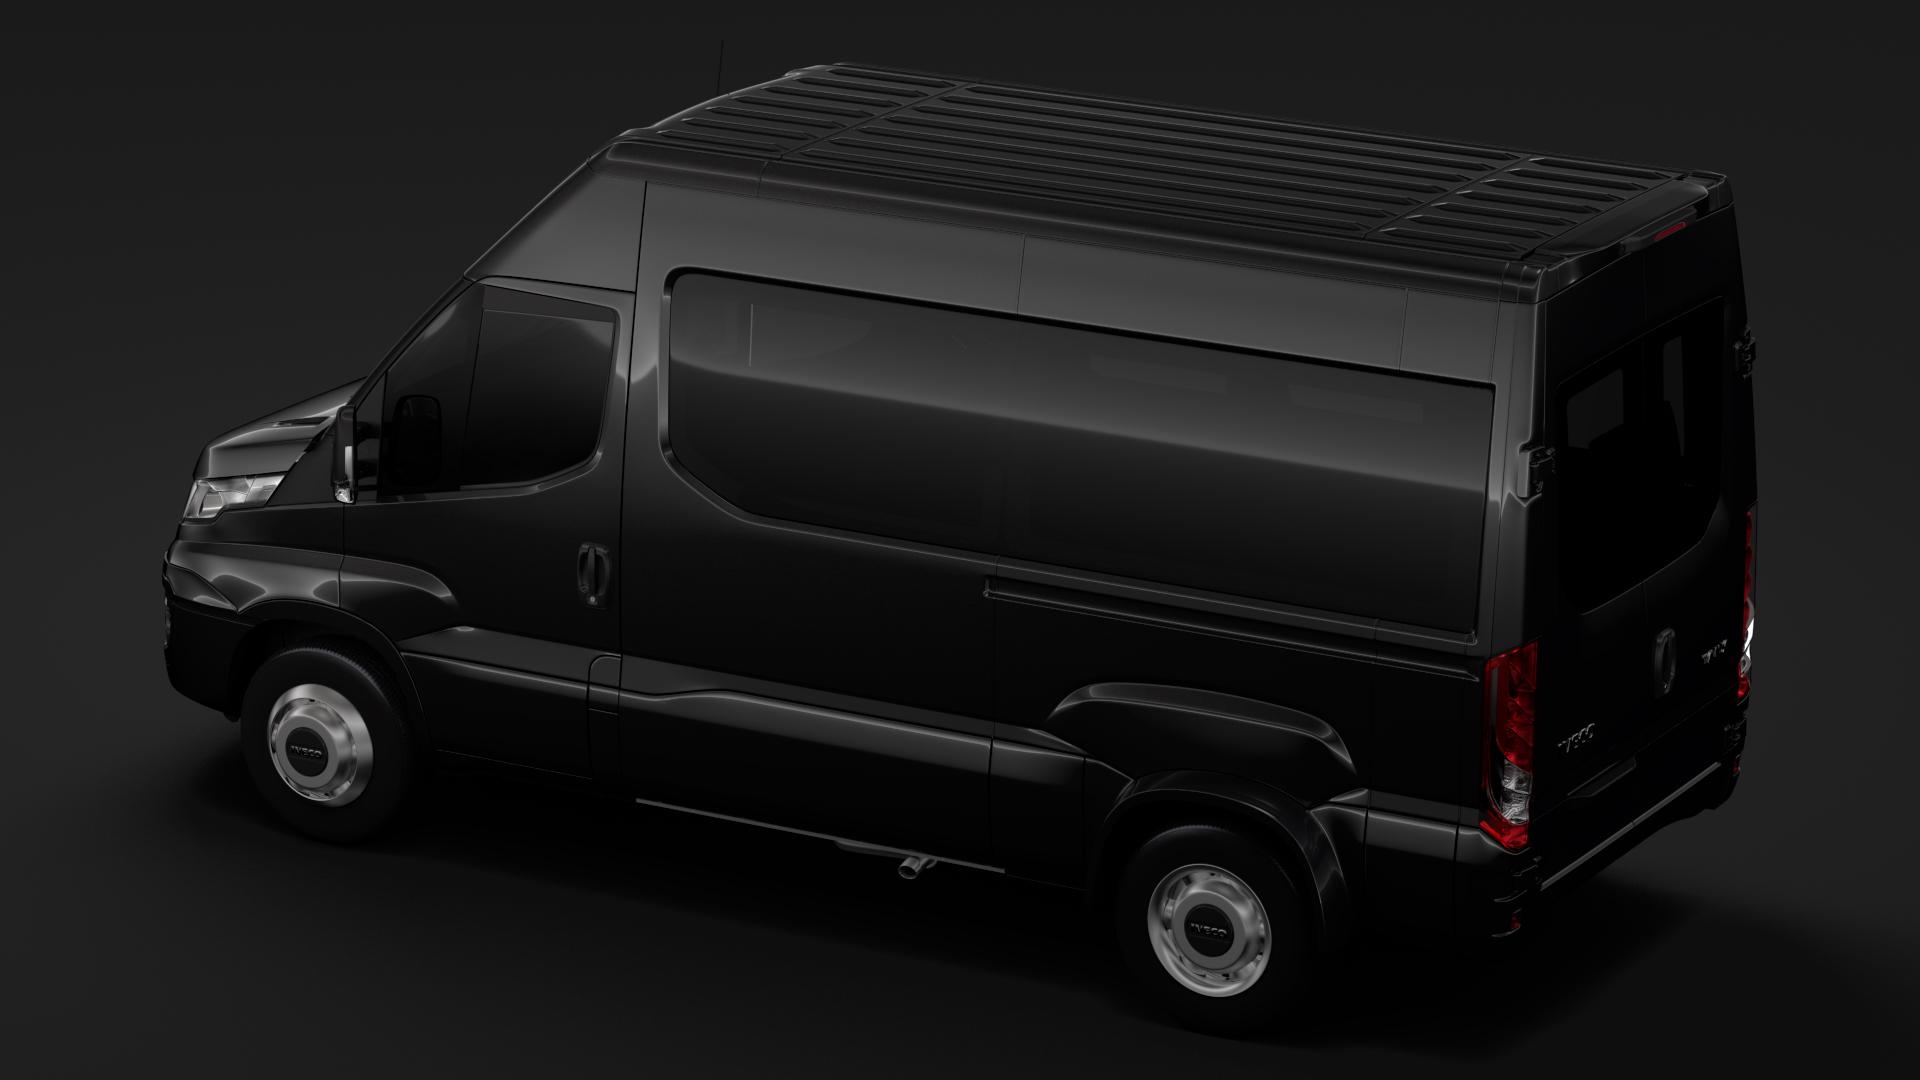 iveco daily minibus l2h2 2017 3d model max fbx c4d lwo ma mb hrc xsi obj 276015